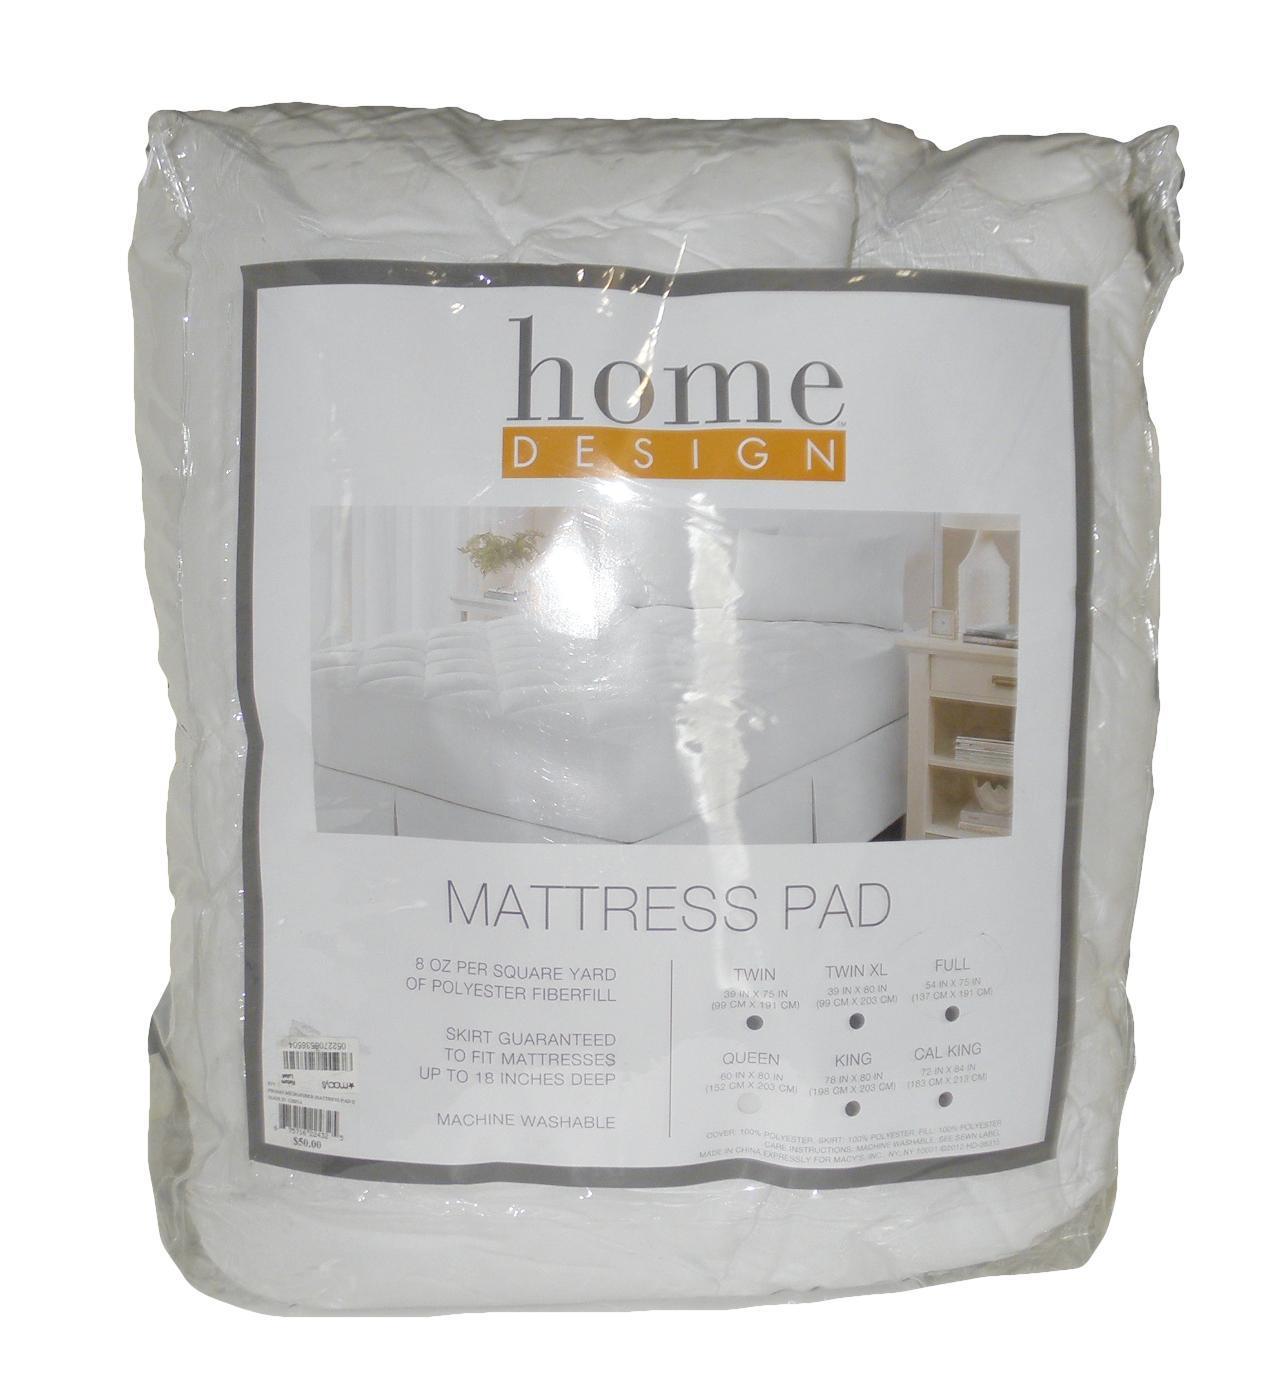 New home design full mattress pad mattress pads feather beds - Home design mattress pads ...